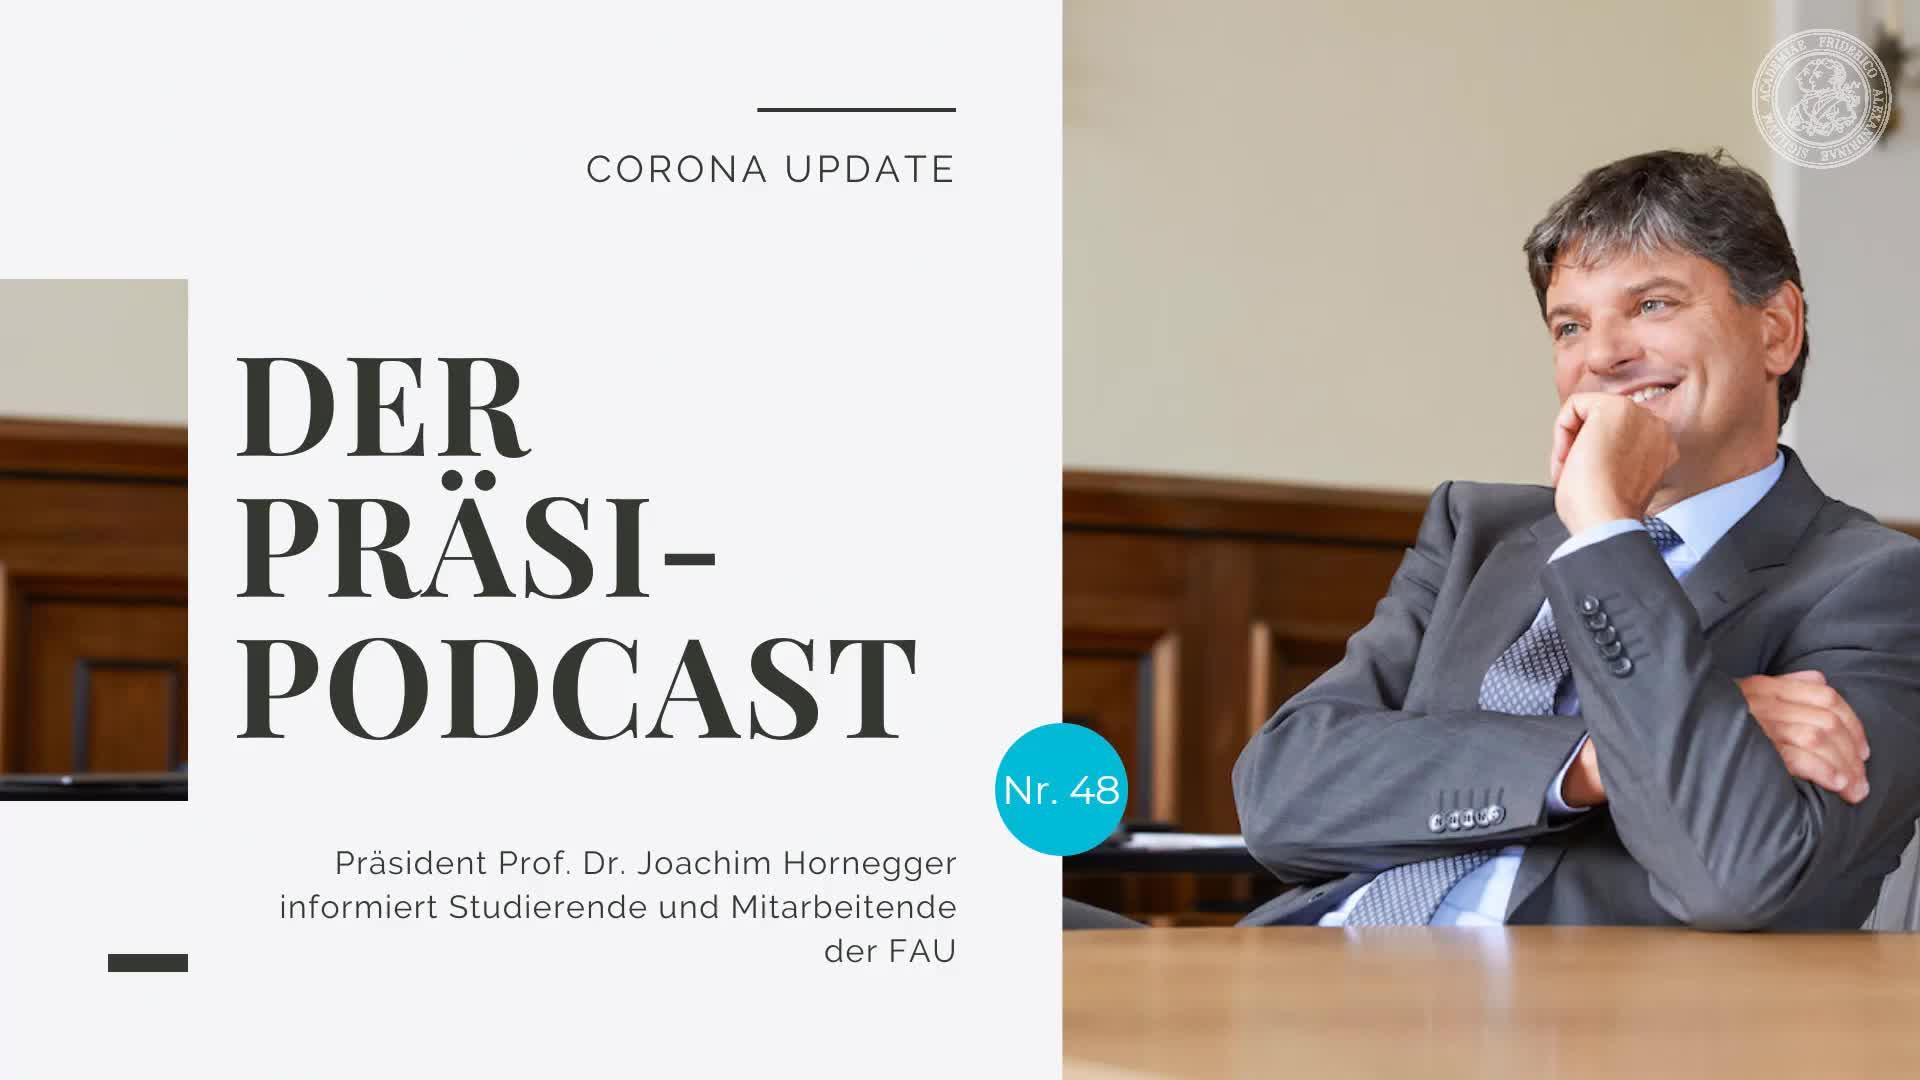 """Der Präsi-Podcast"" vom 13.7.2021 preview image"